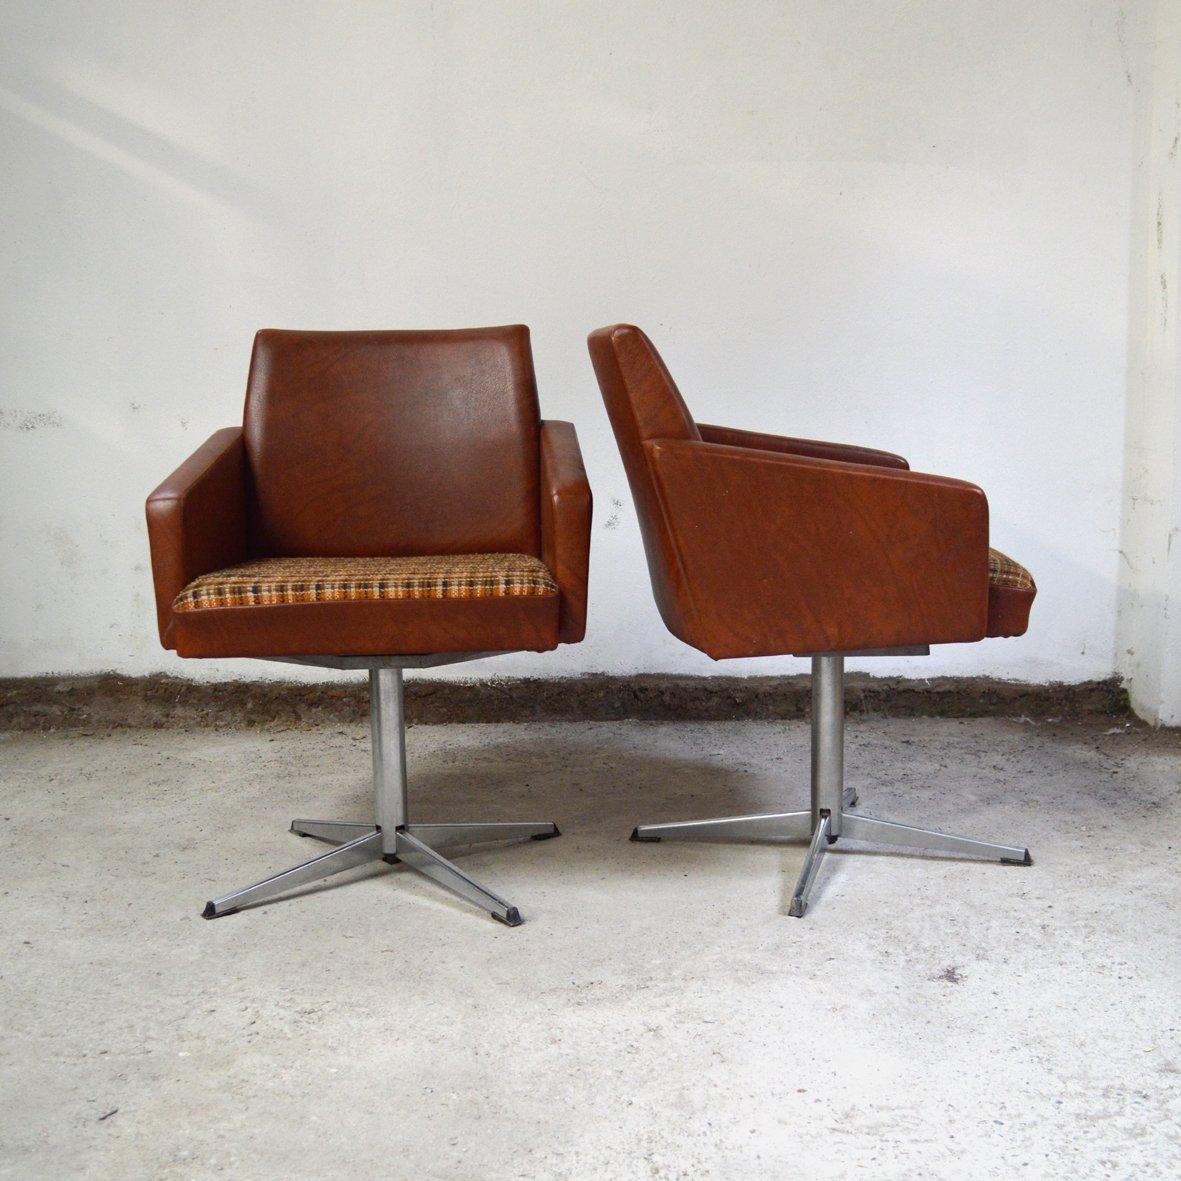 fauteuils visitor en ska 1970s set de 2 en vente sur pamono. Black Bedroom Furniture Sets. Home Design Ideas